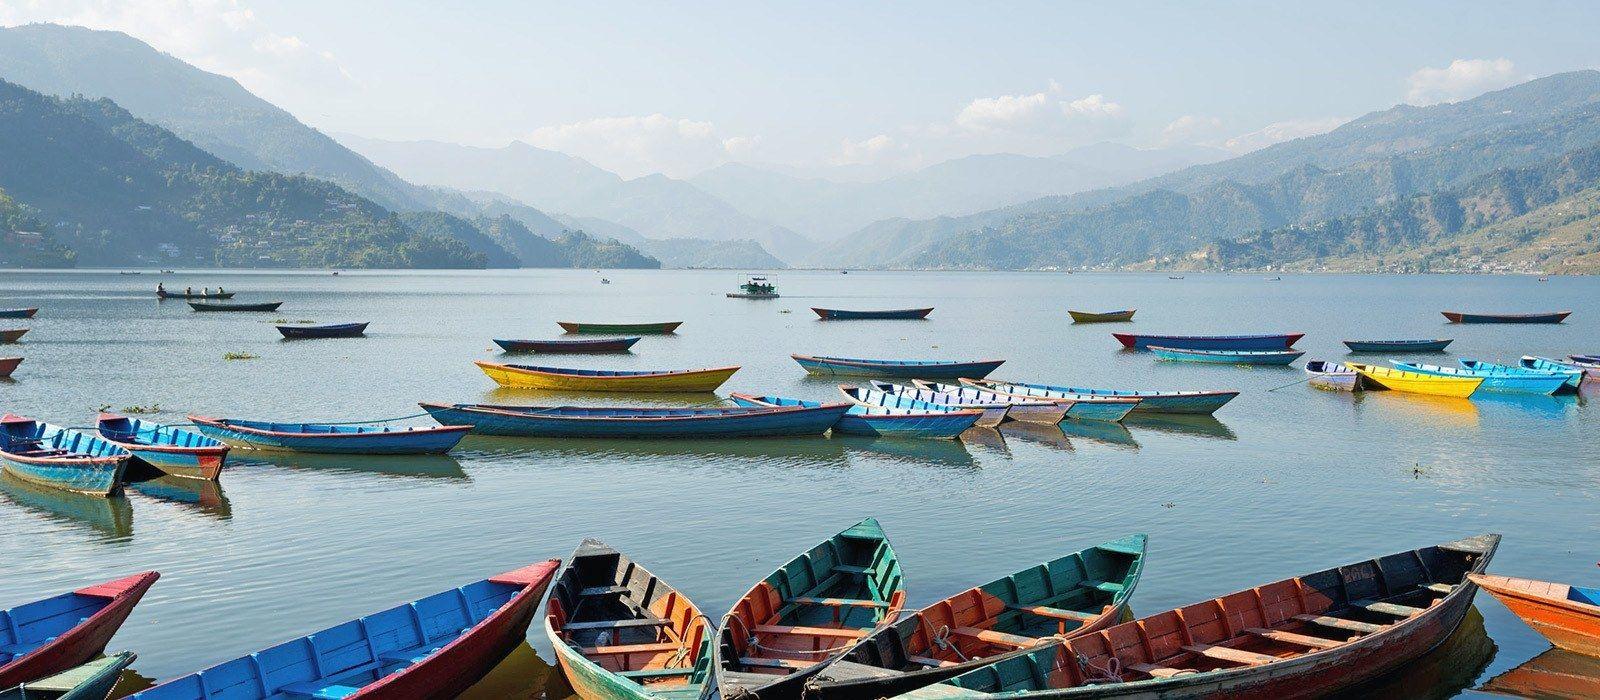 Nepal & Indien: Beeindruckender Himalaja & kulturelle Vielfalt Urlaub 2